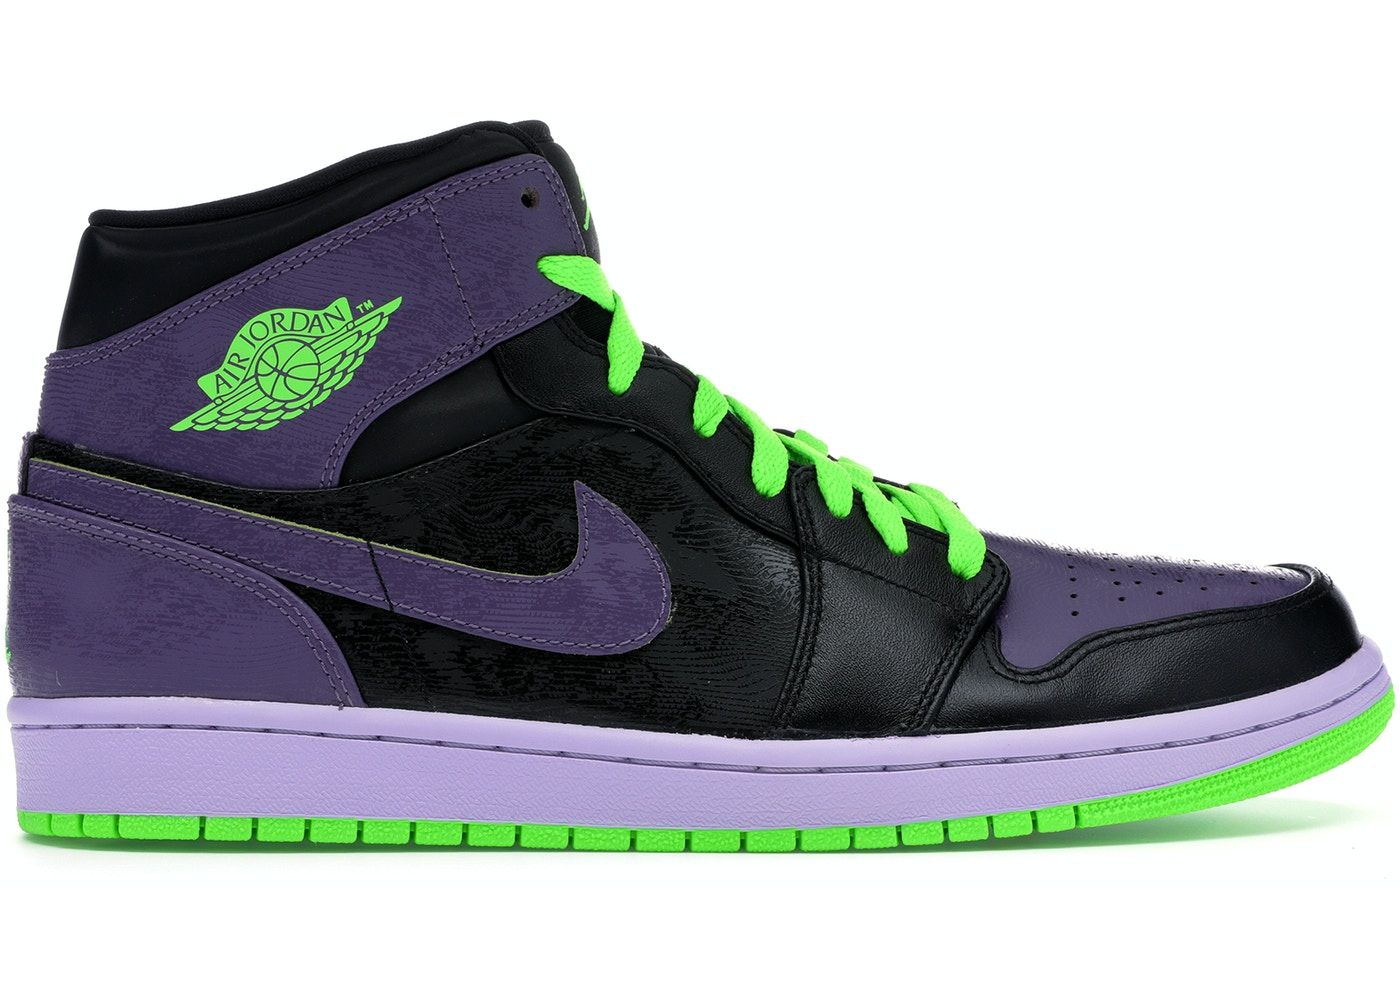 09d1237d68b6b5 Jordan 1 Retro Night Vision Joker - 136065-021